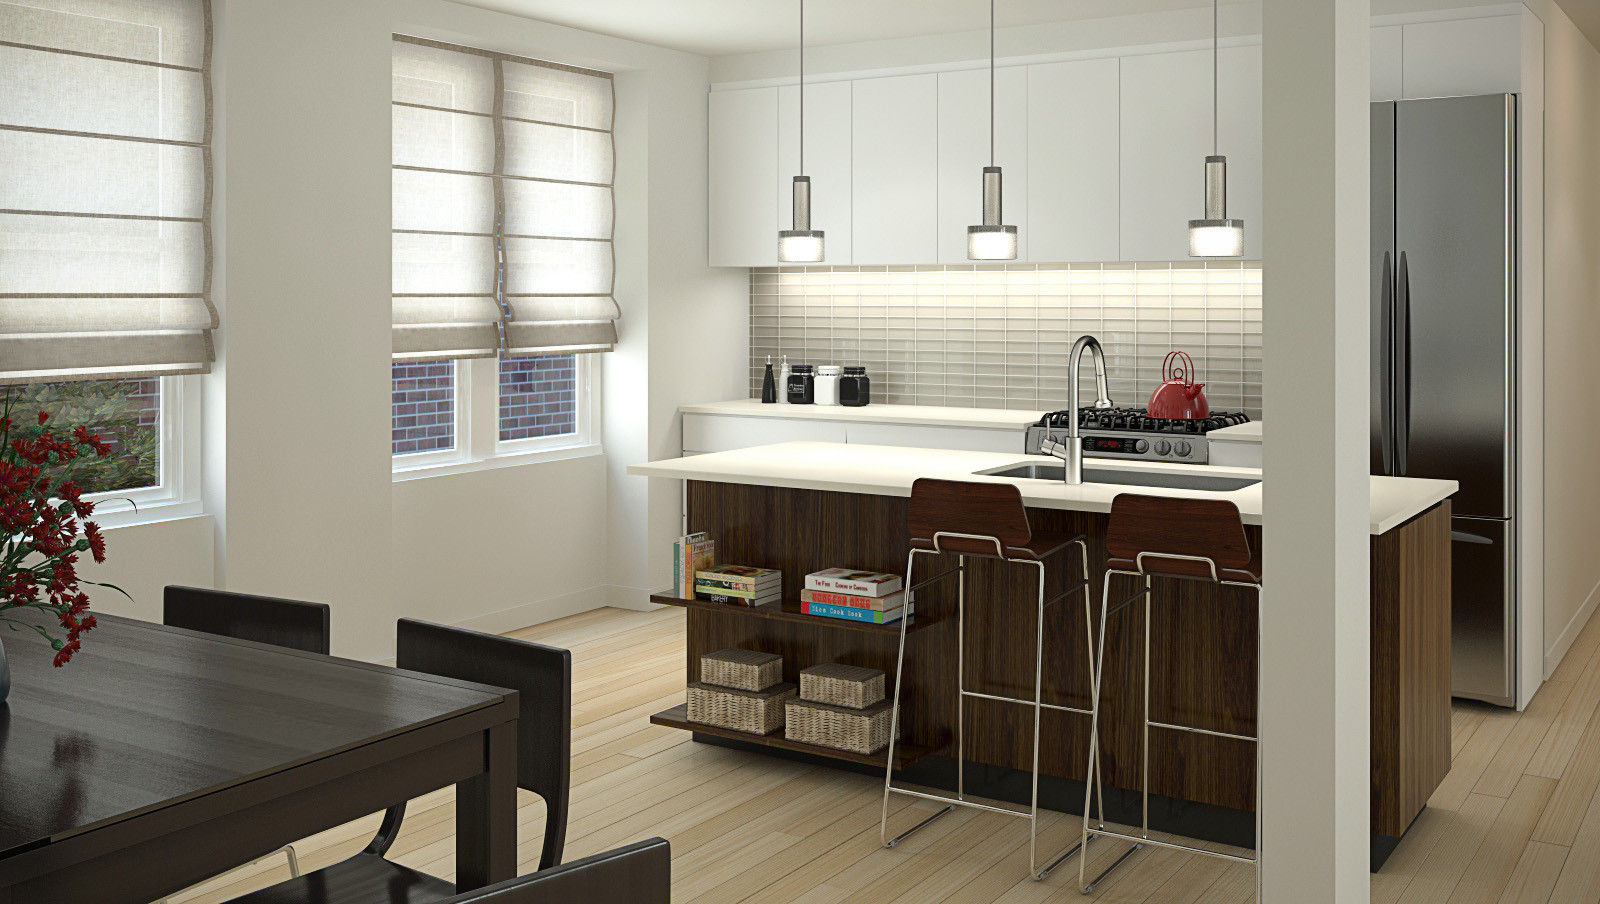 2070_stribling_kitchen_17_adj.jpg